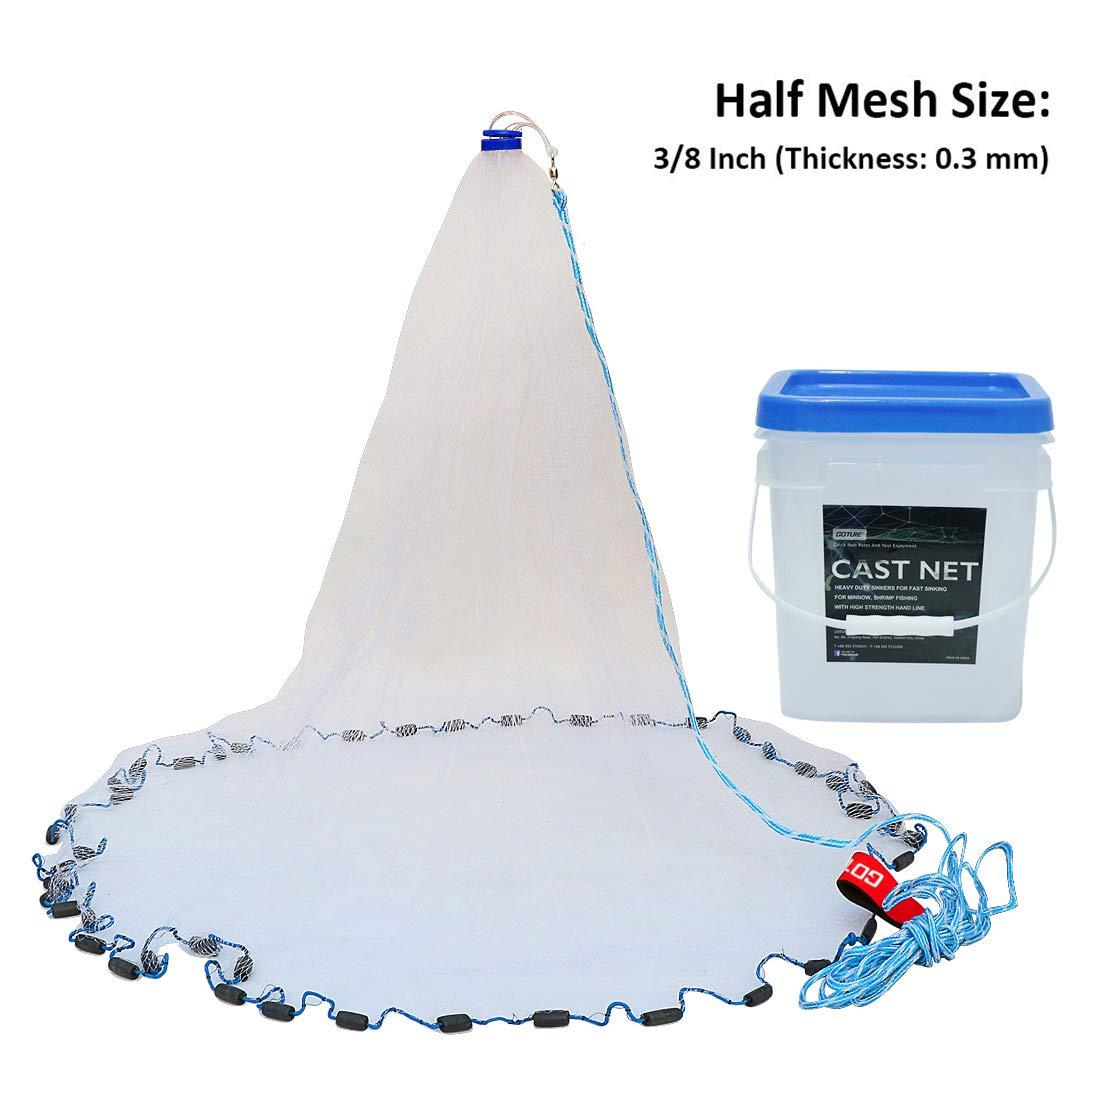 Goture American Saltwater Fishing Netを餌トラップキャスト魚4 ft / 6ft / 8ft / 10ft / 12ft半径20 cm、3 / 8インチメッシュサイズ B01ARX5XBA 4 Feet* 3/8 Inch/1.5KG 4 Feet* 3/8 Inch/1.5KG